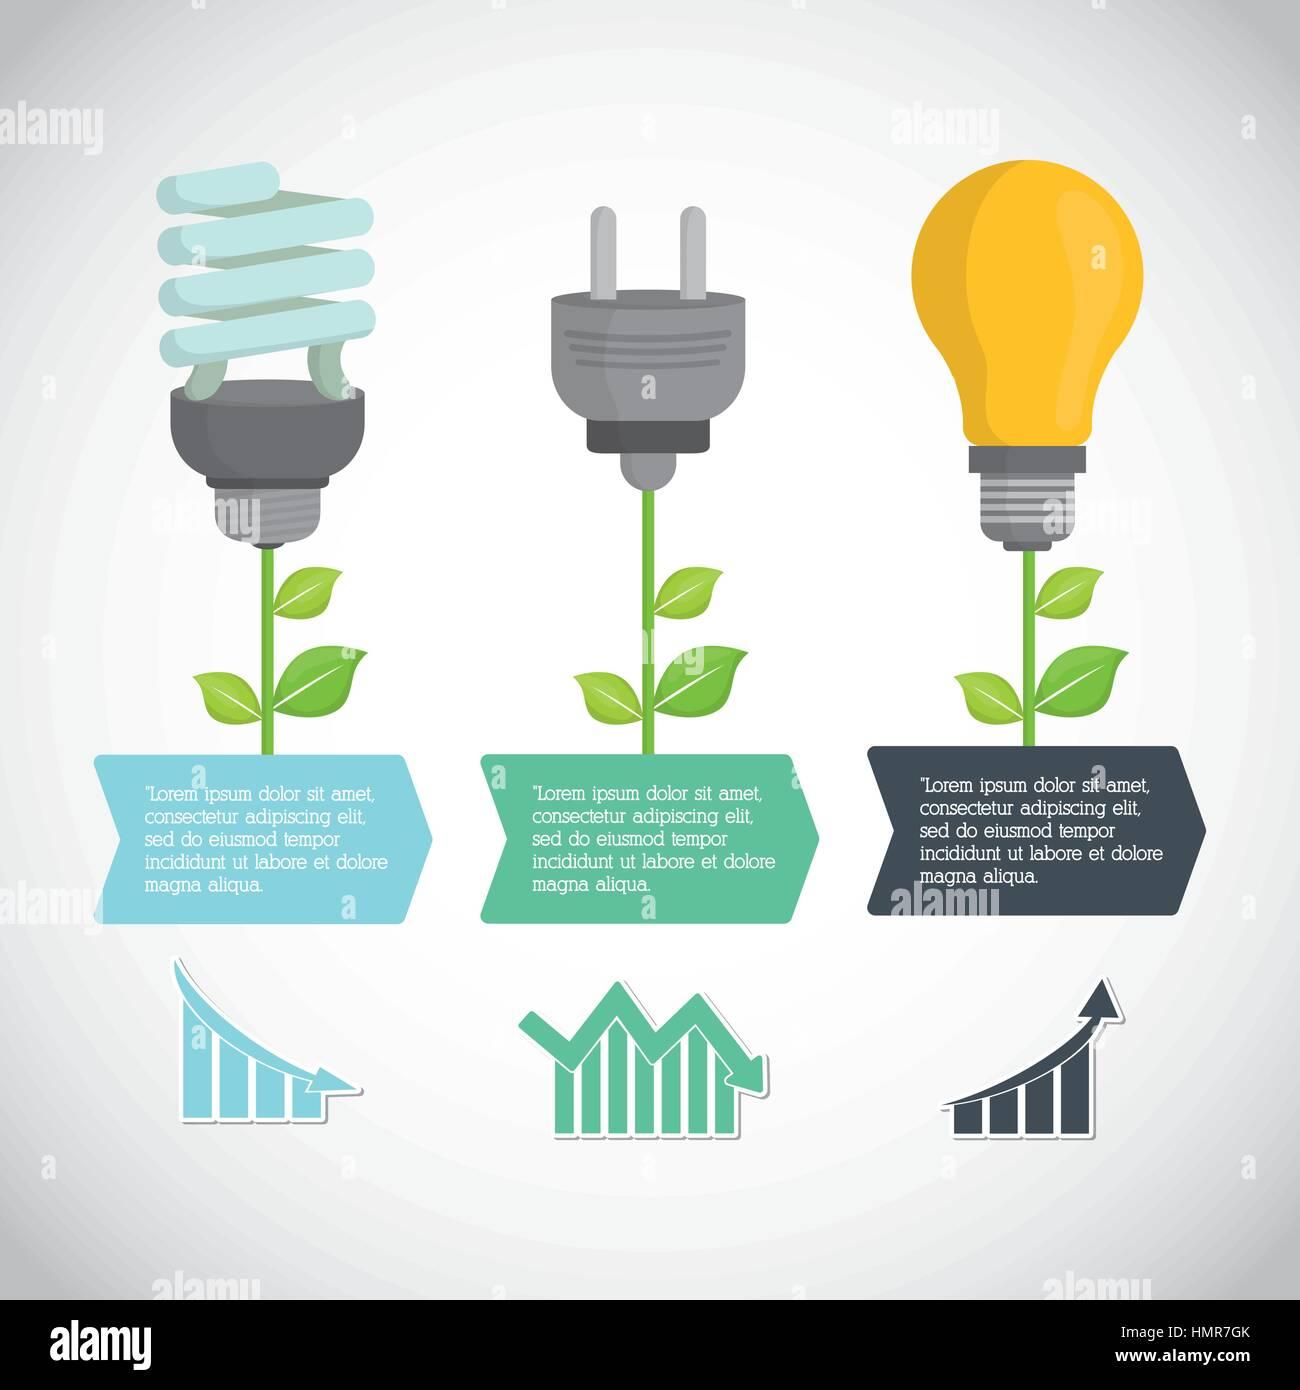 environmental care icon design - Stock Image